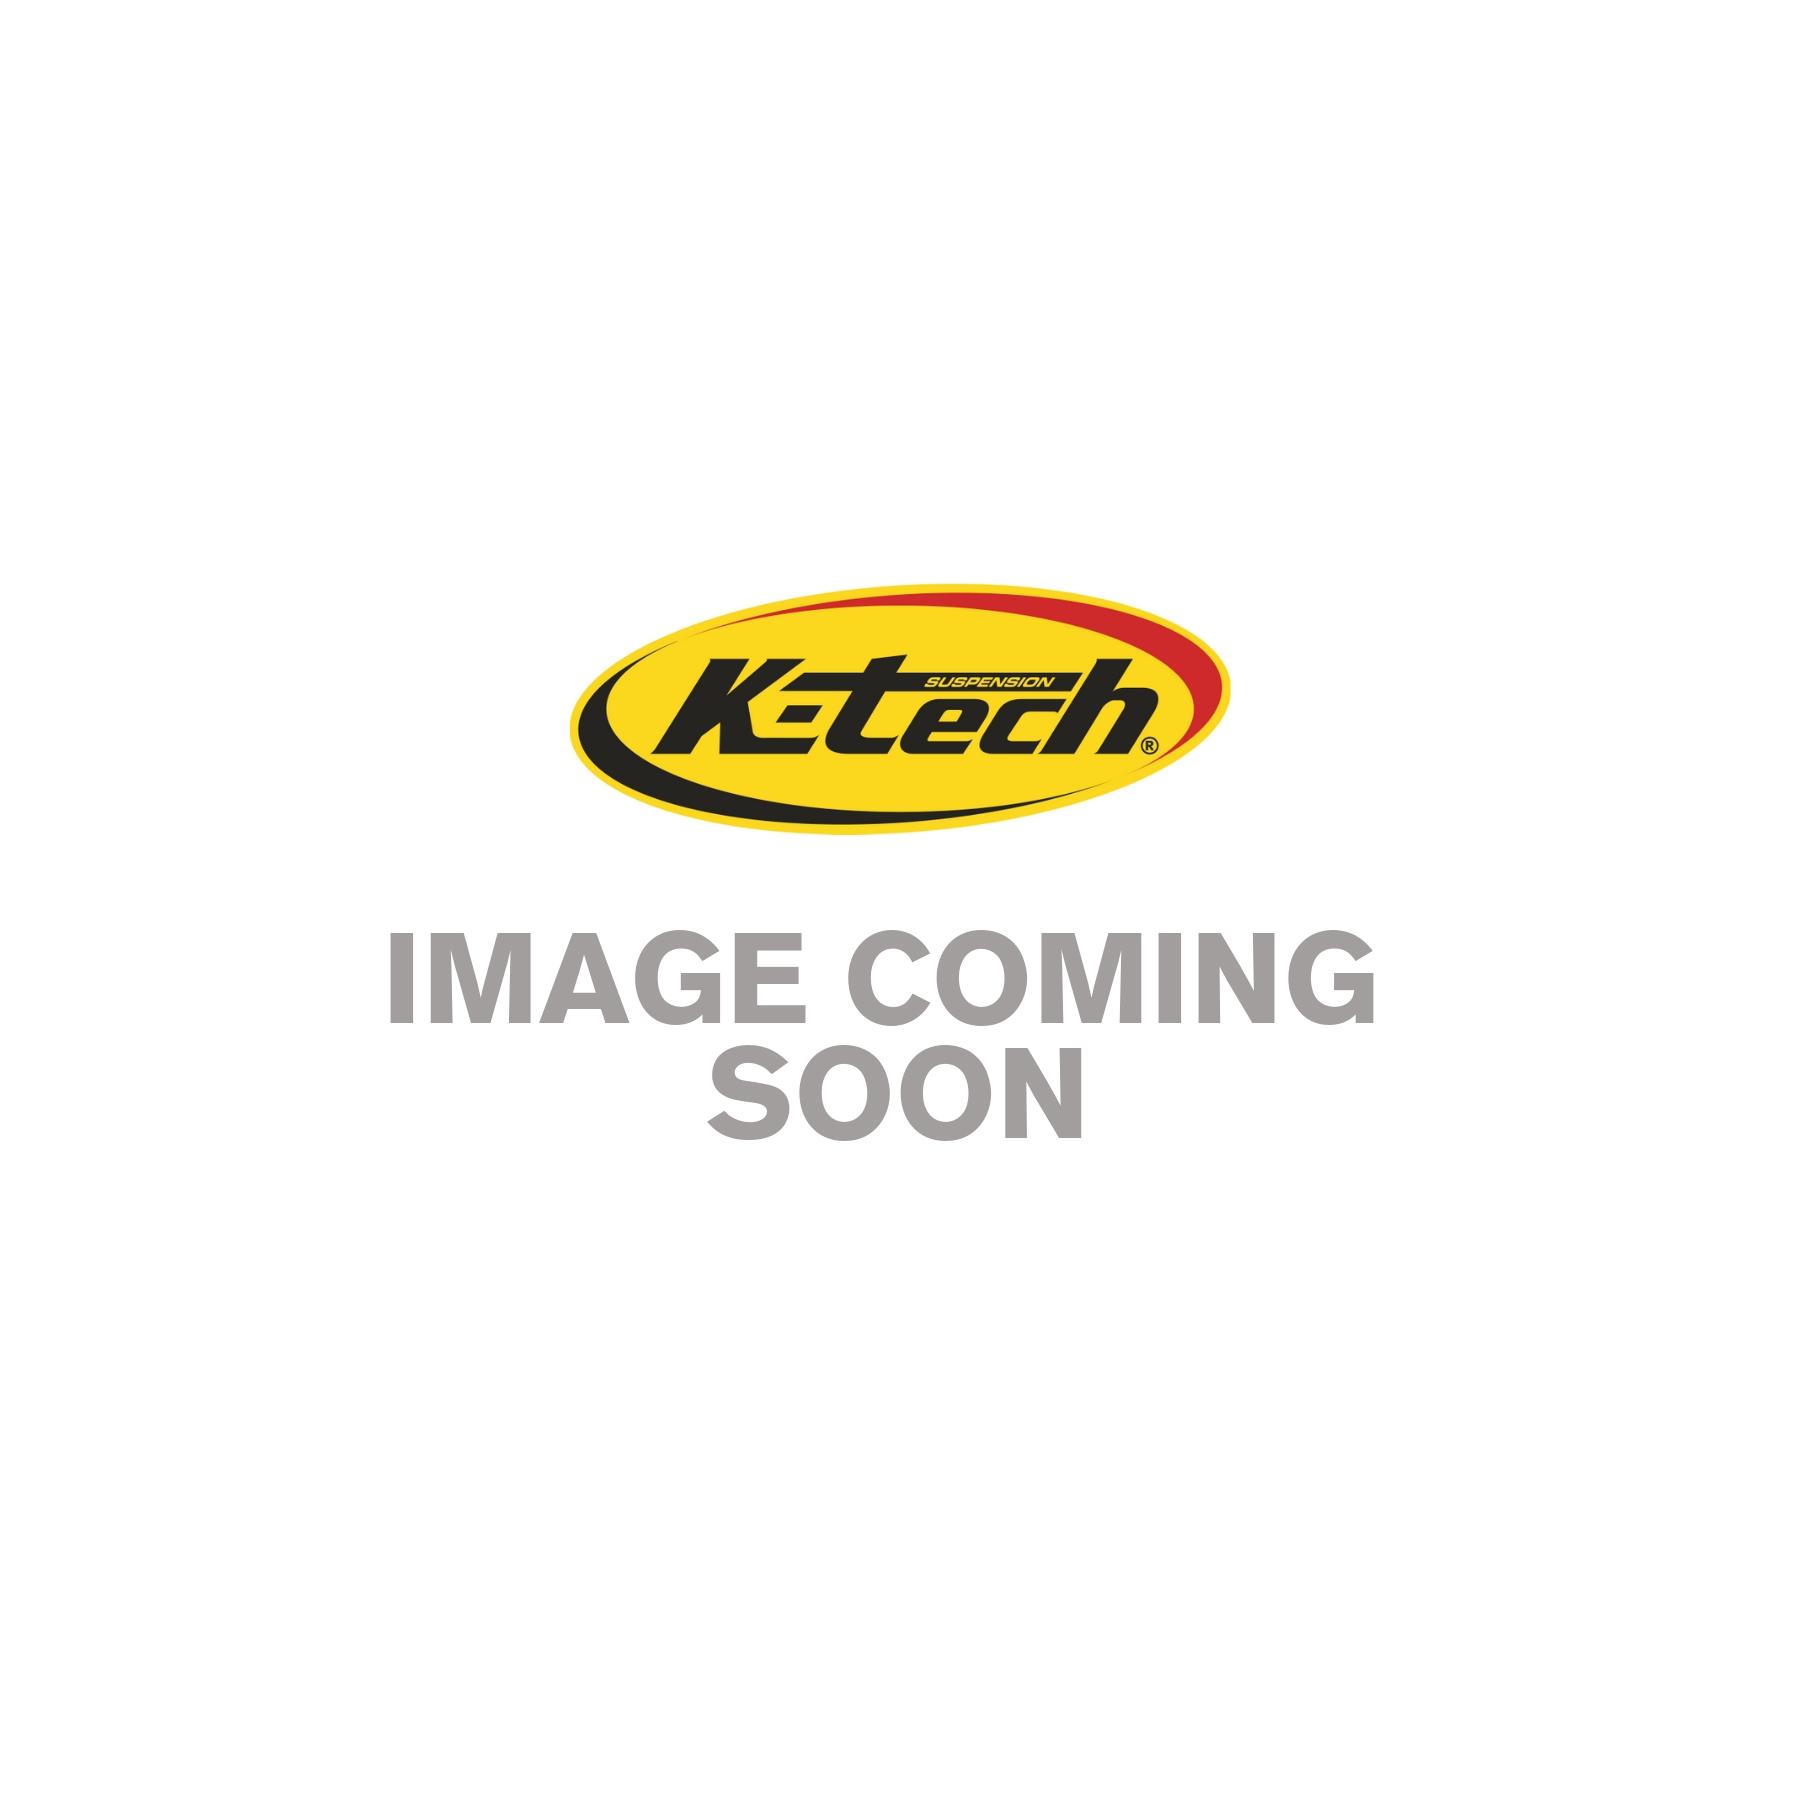 RDS Front Fork Cartridges Honda CBR900RR 2000-2003 Showa